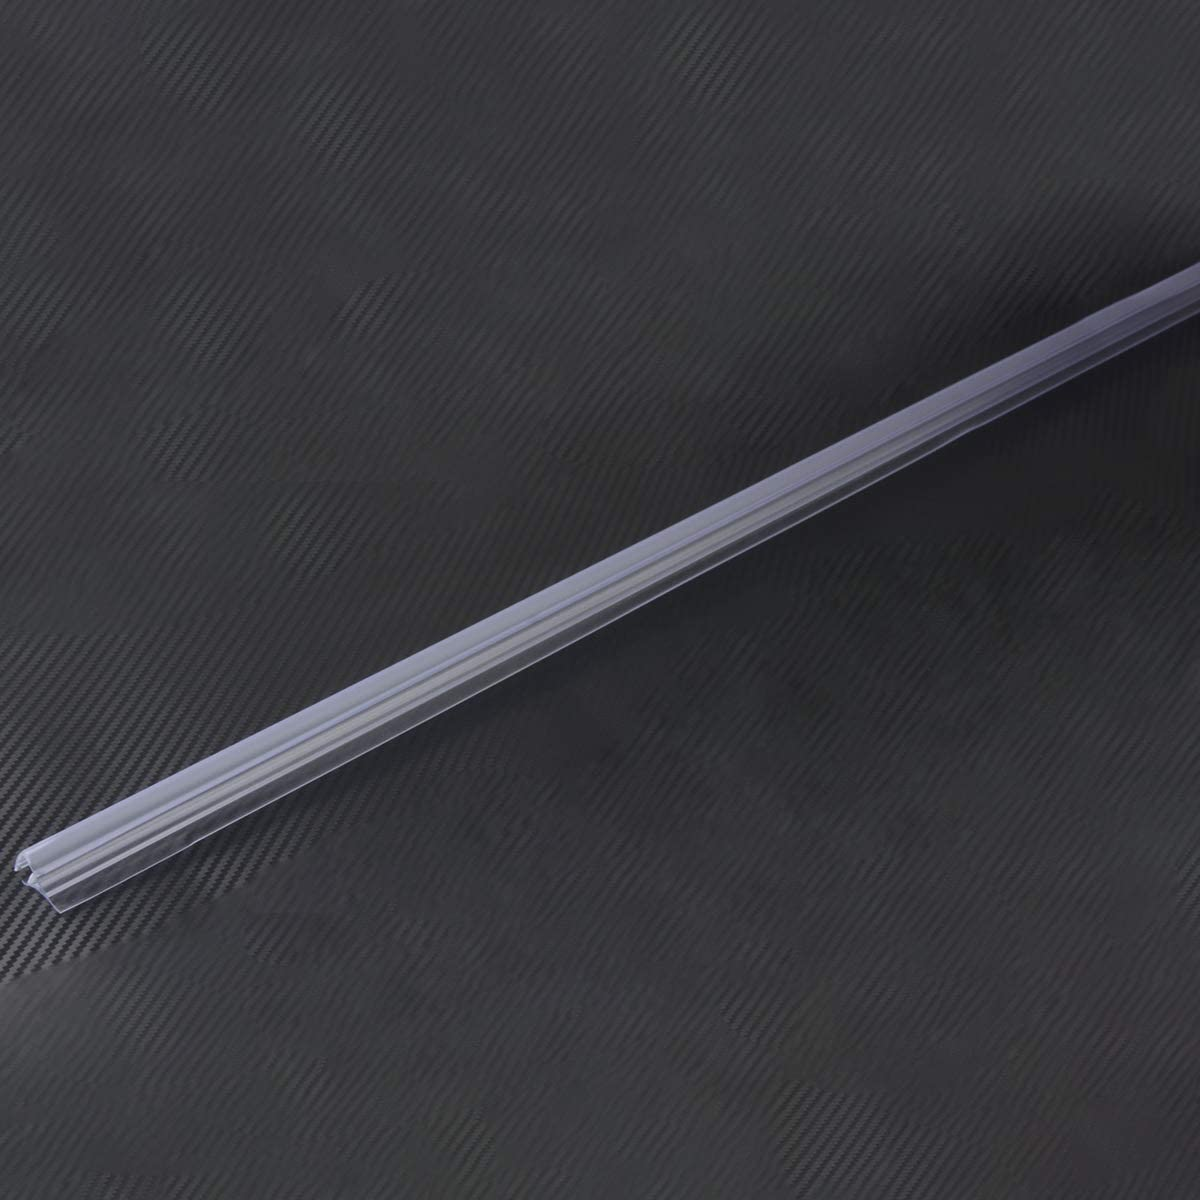 Sello inferior de la puerta de ducha Queenbox 66 cm PVC transparente Ba/ño Pantalla de ducha Tira de sello de puerta Separador de 11 mm Tira de sello de gabinete de ducha para vidrio sin marco de 8 mm